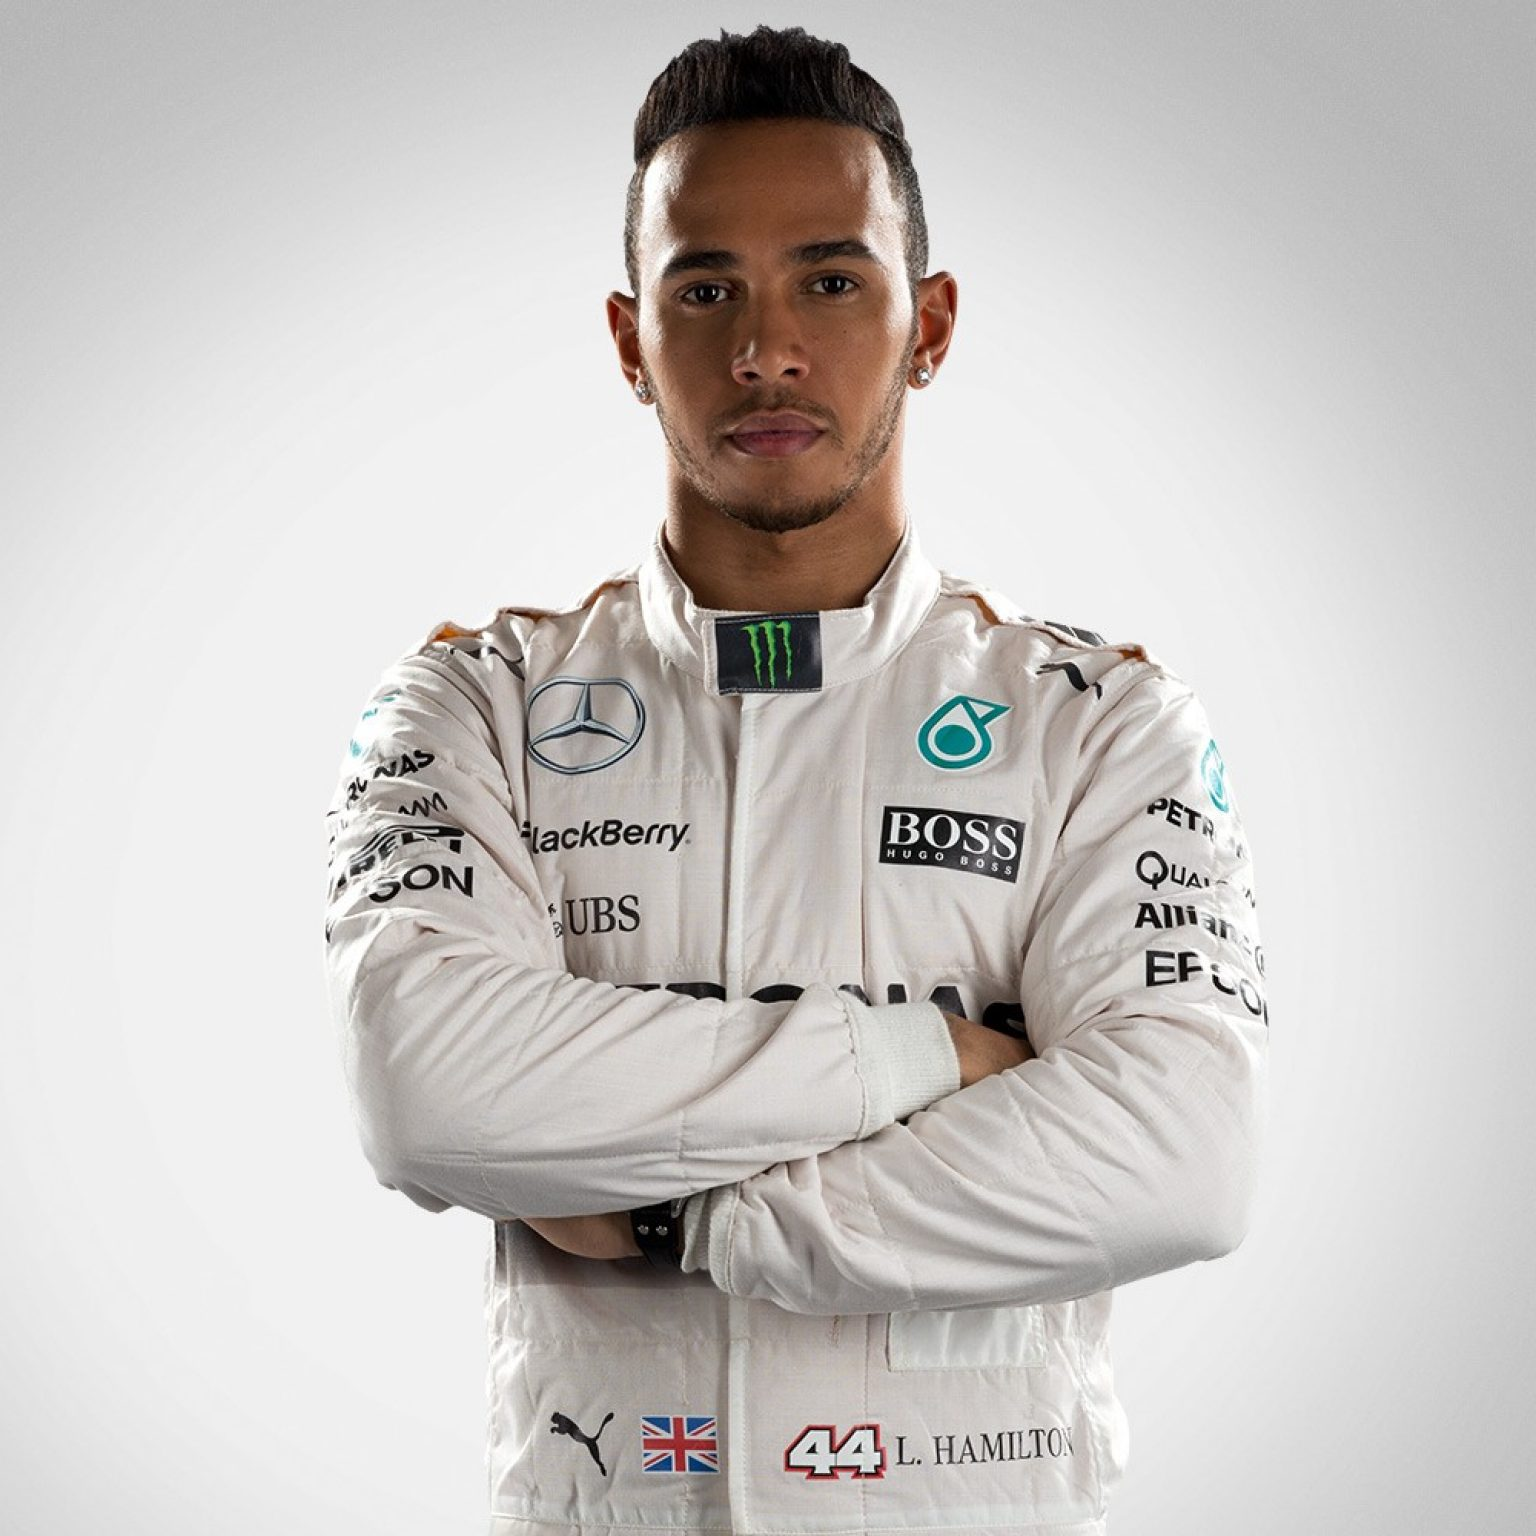 c08c2a334 2018 Formula One Season | The Formula 1 Wiki | FANDOM powered by Wikia